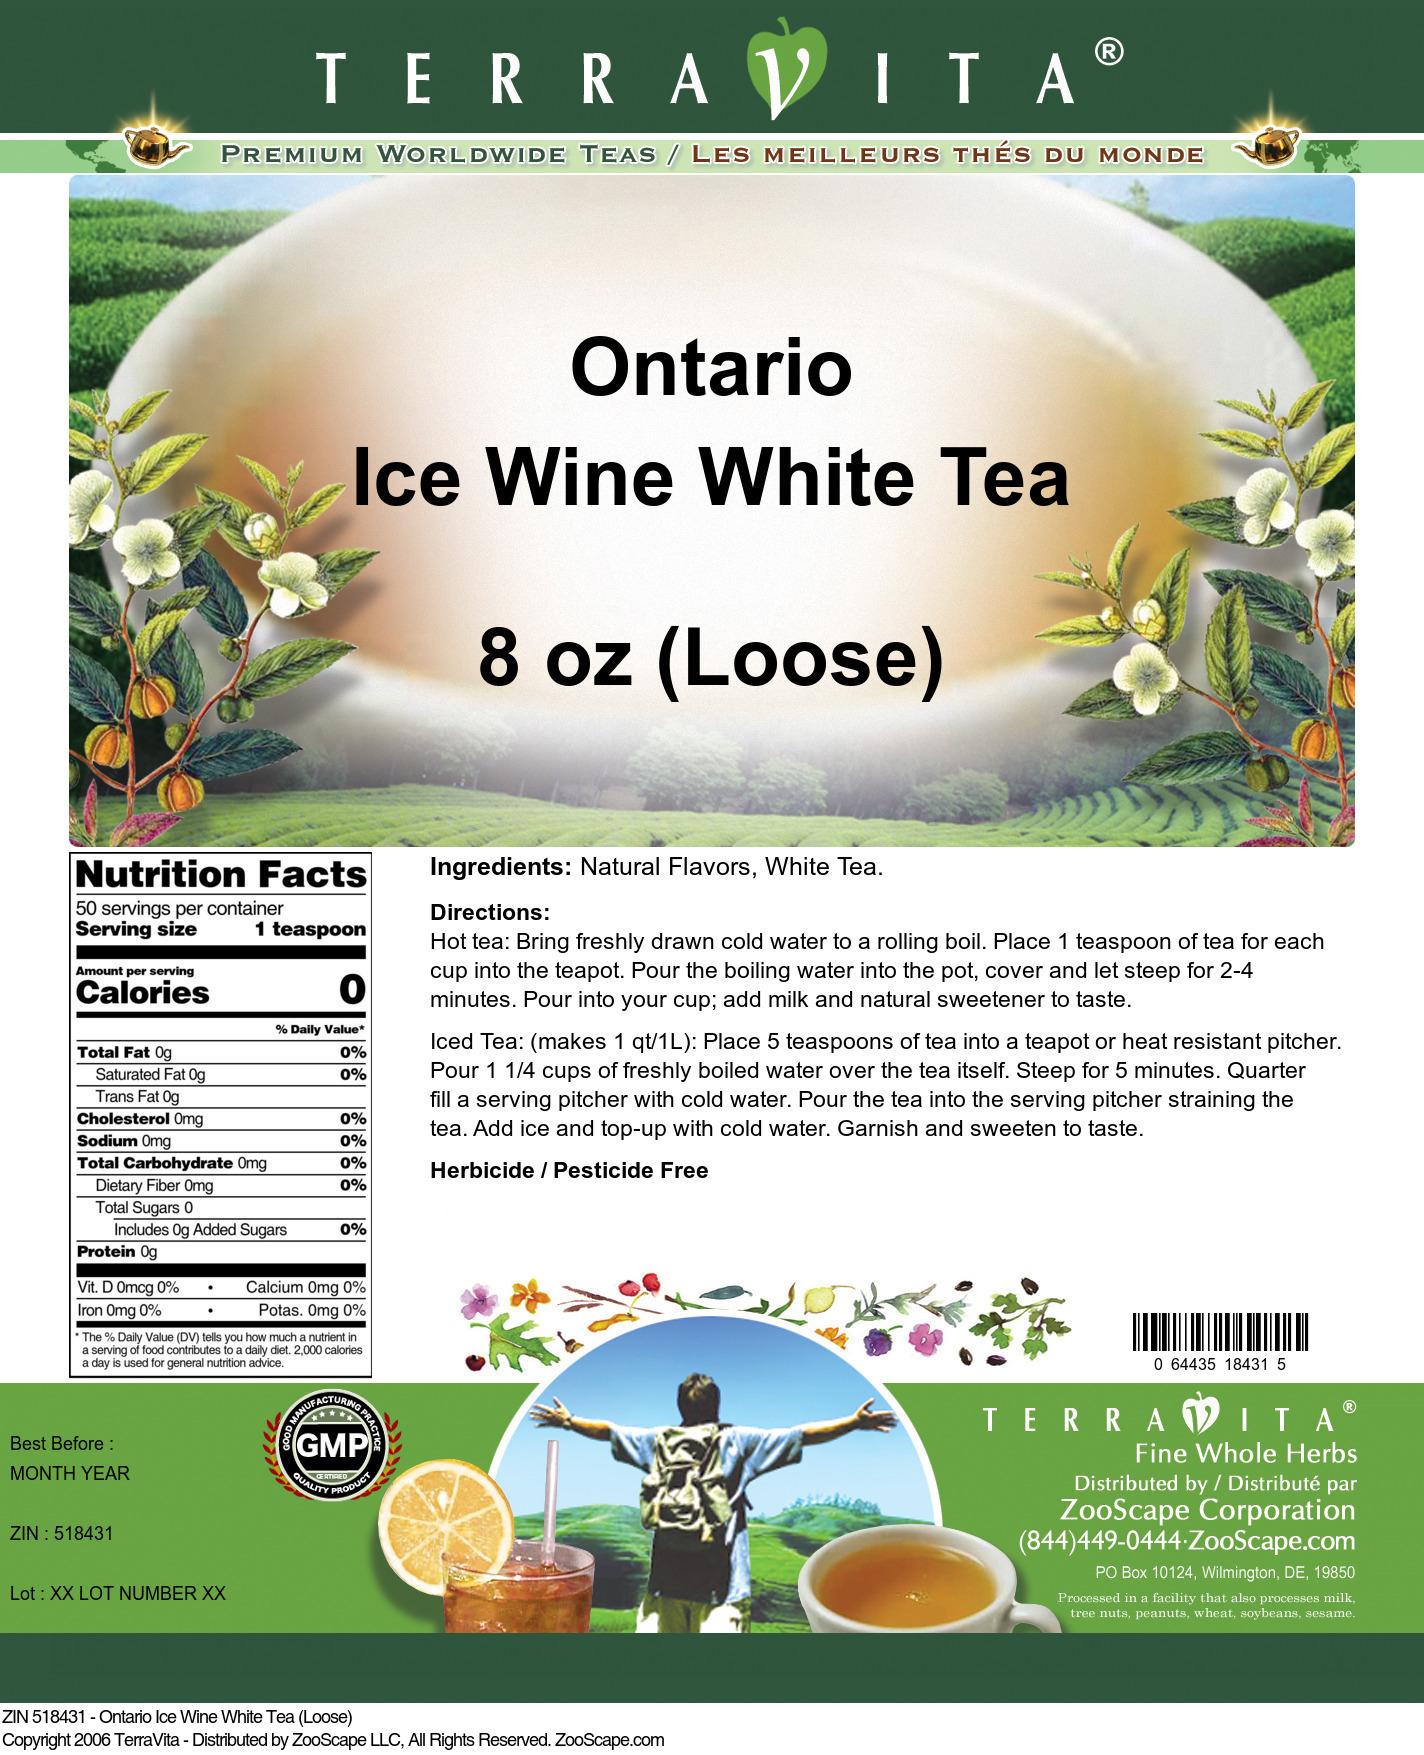 Ontario Ice Wine White Tea (Loose)